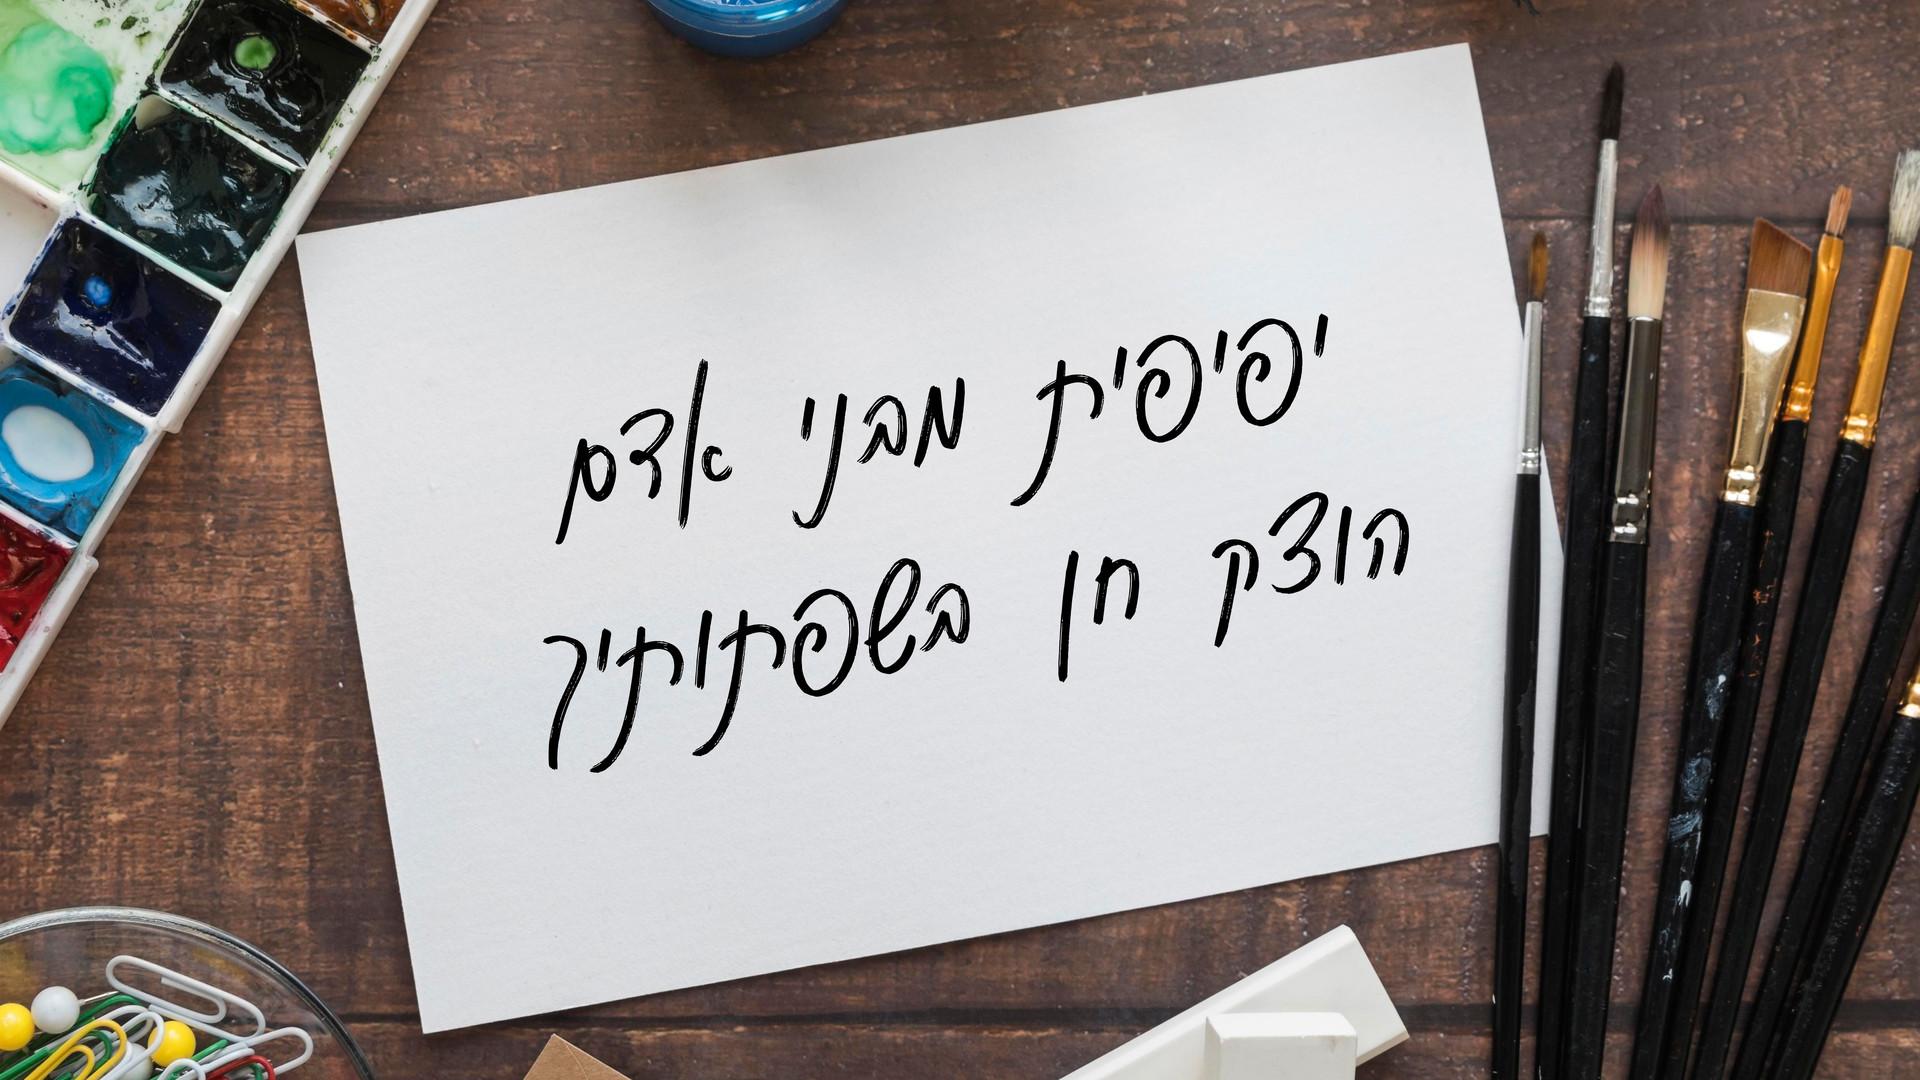 Fresco Hebrew font